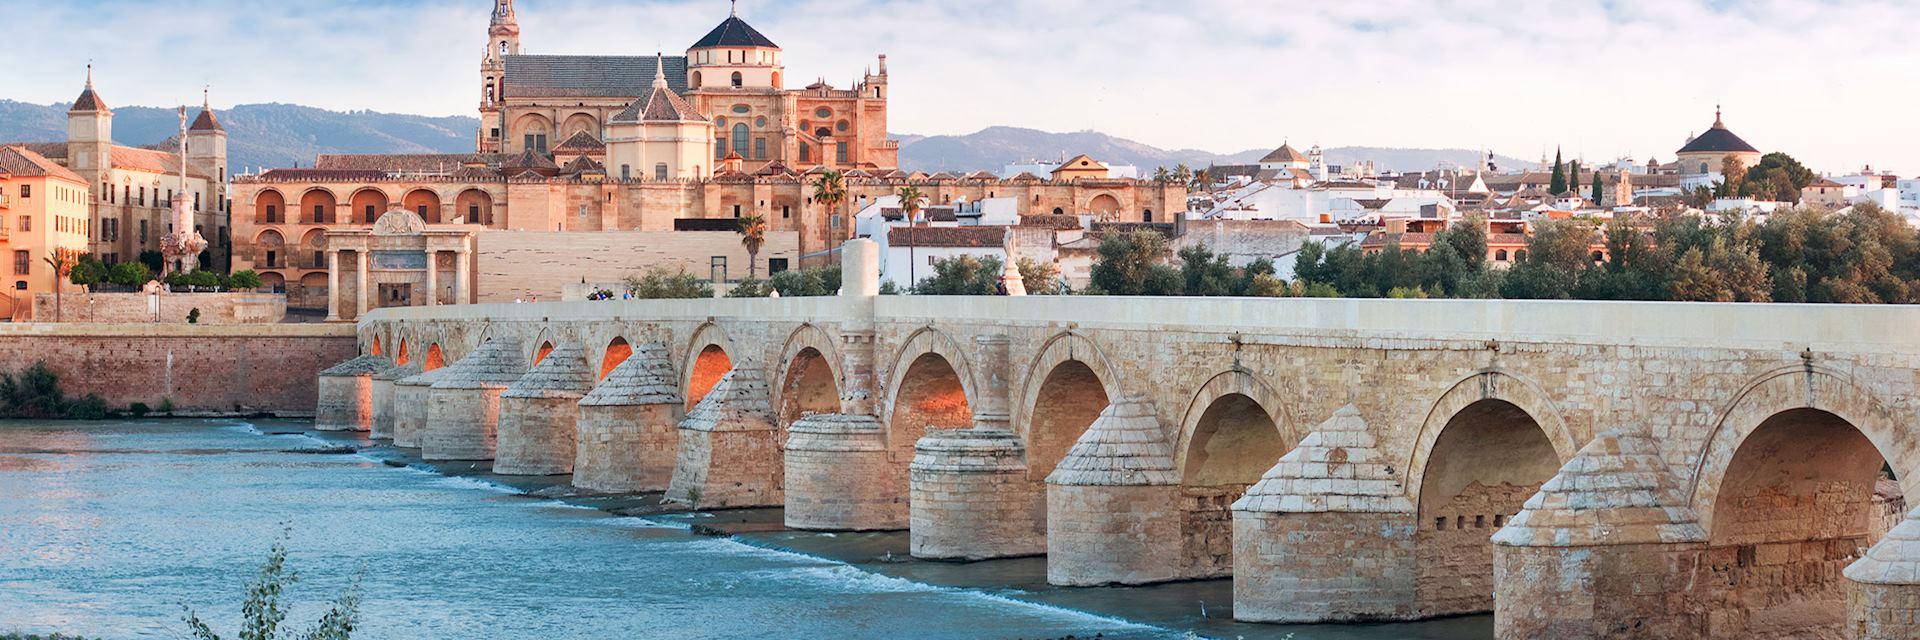 Roman Bridge and Guadalquivir river, Great Mosque, Córdoba